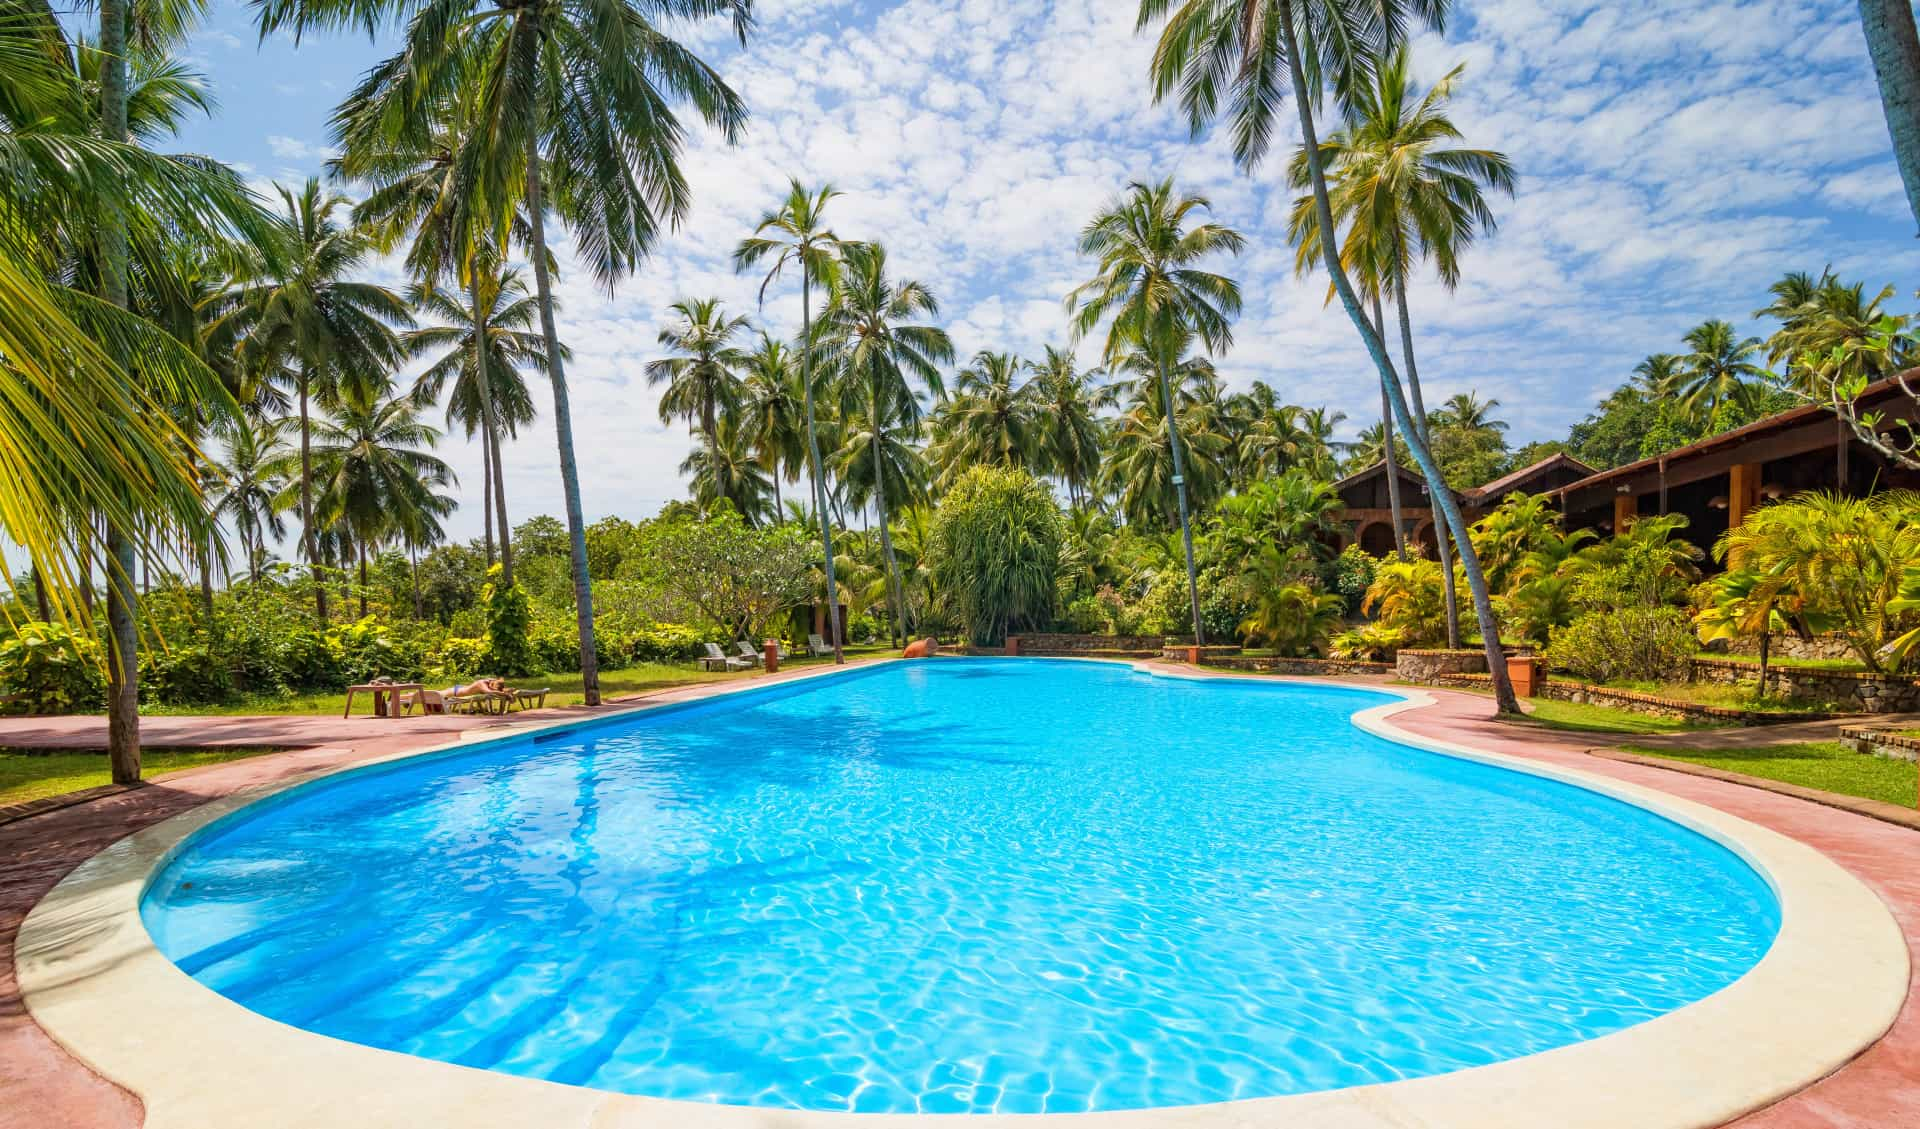 Soak in the summer: Must-visit hot springs in the US